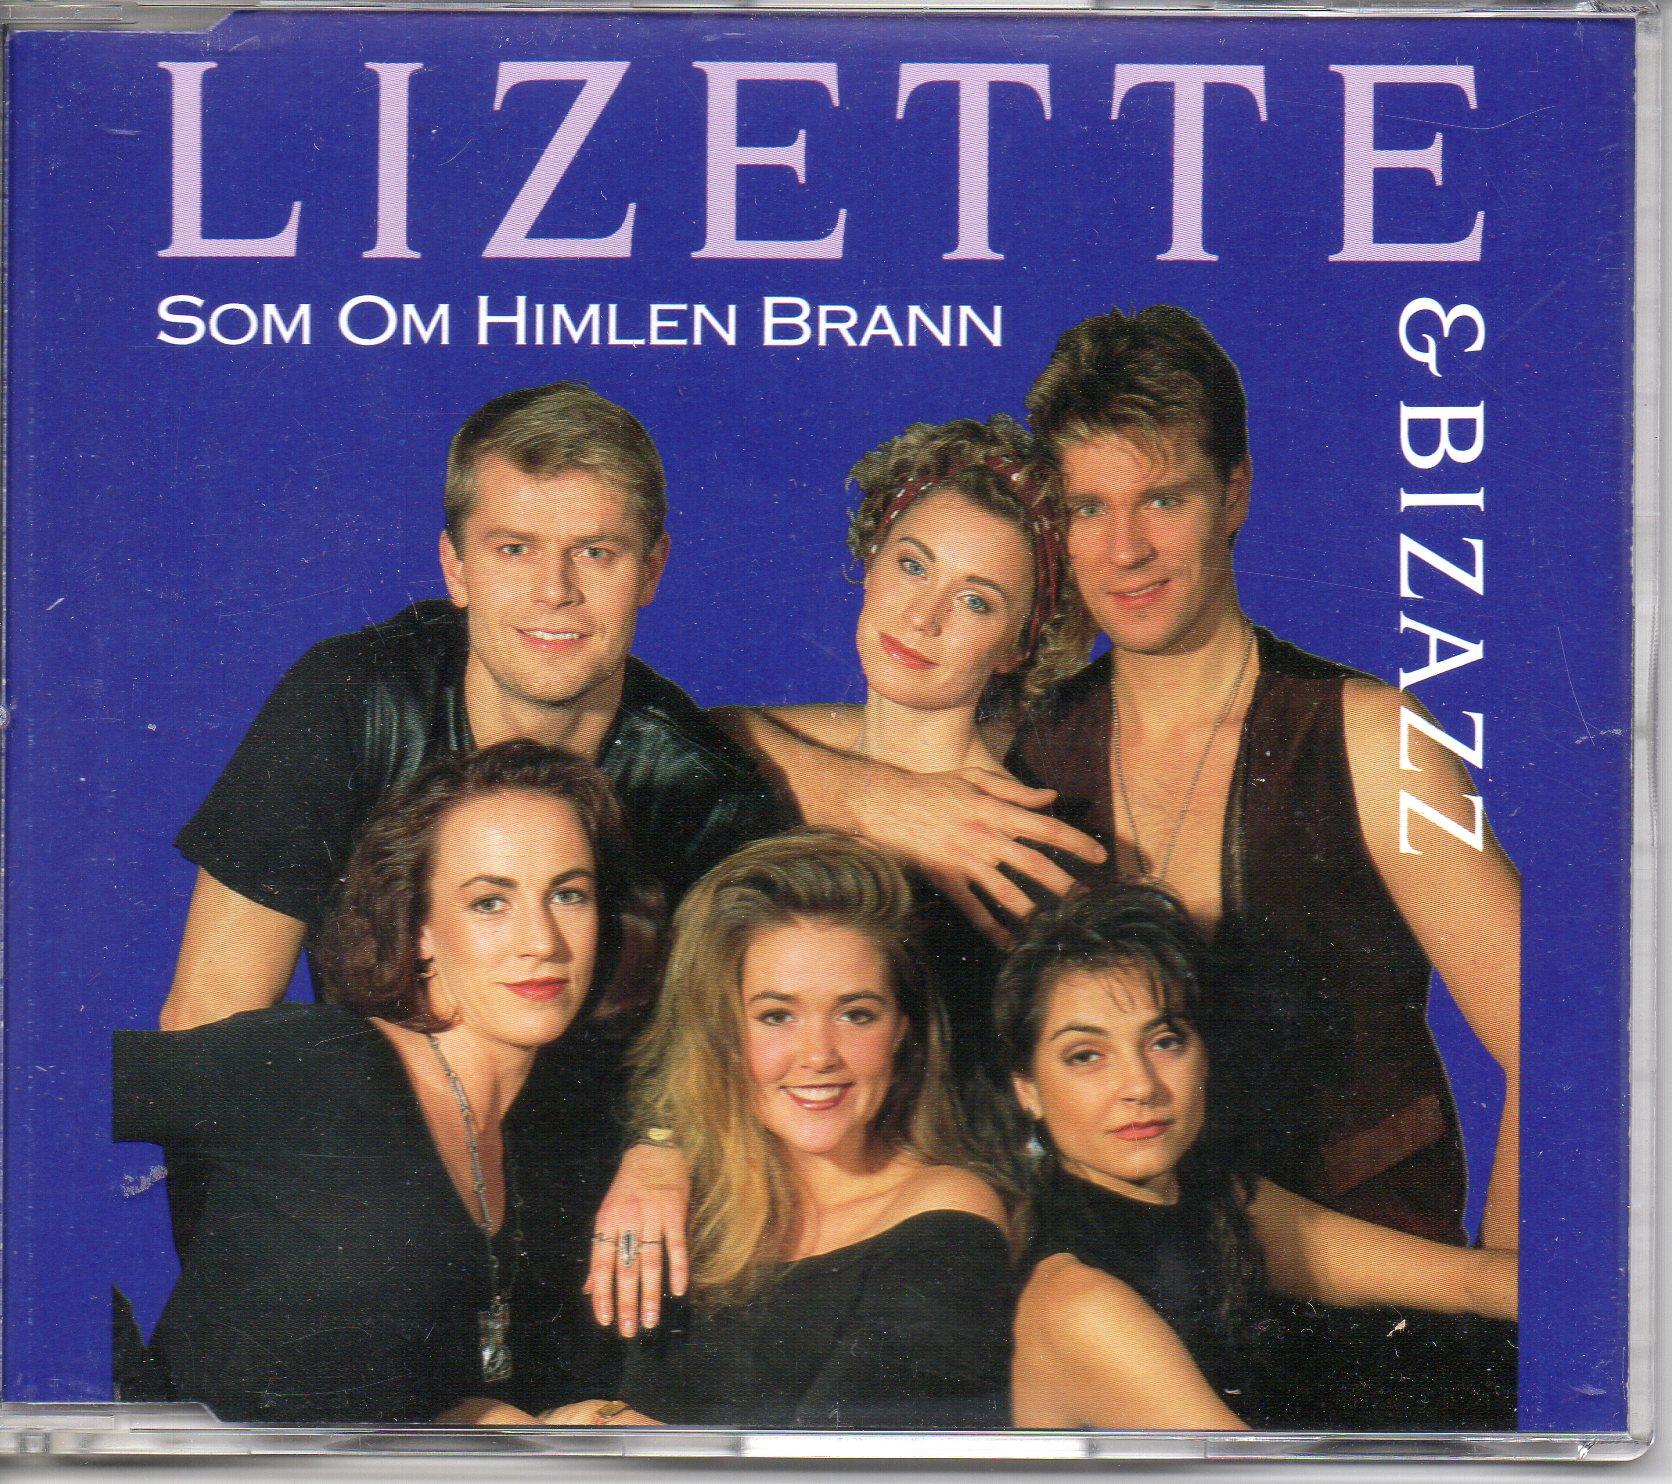 EUROVISION 1992 SUÈDE : LIZETTE & BIZAZZ - PRÉSELE - Som Om Himlen Brann 2-track Jewel case - CD Maxi